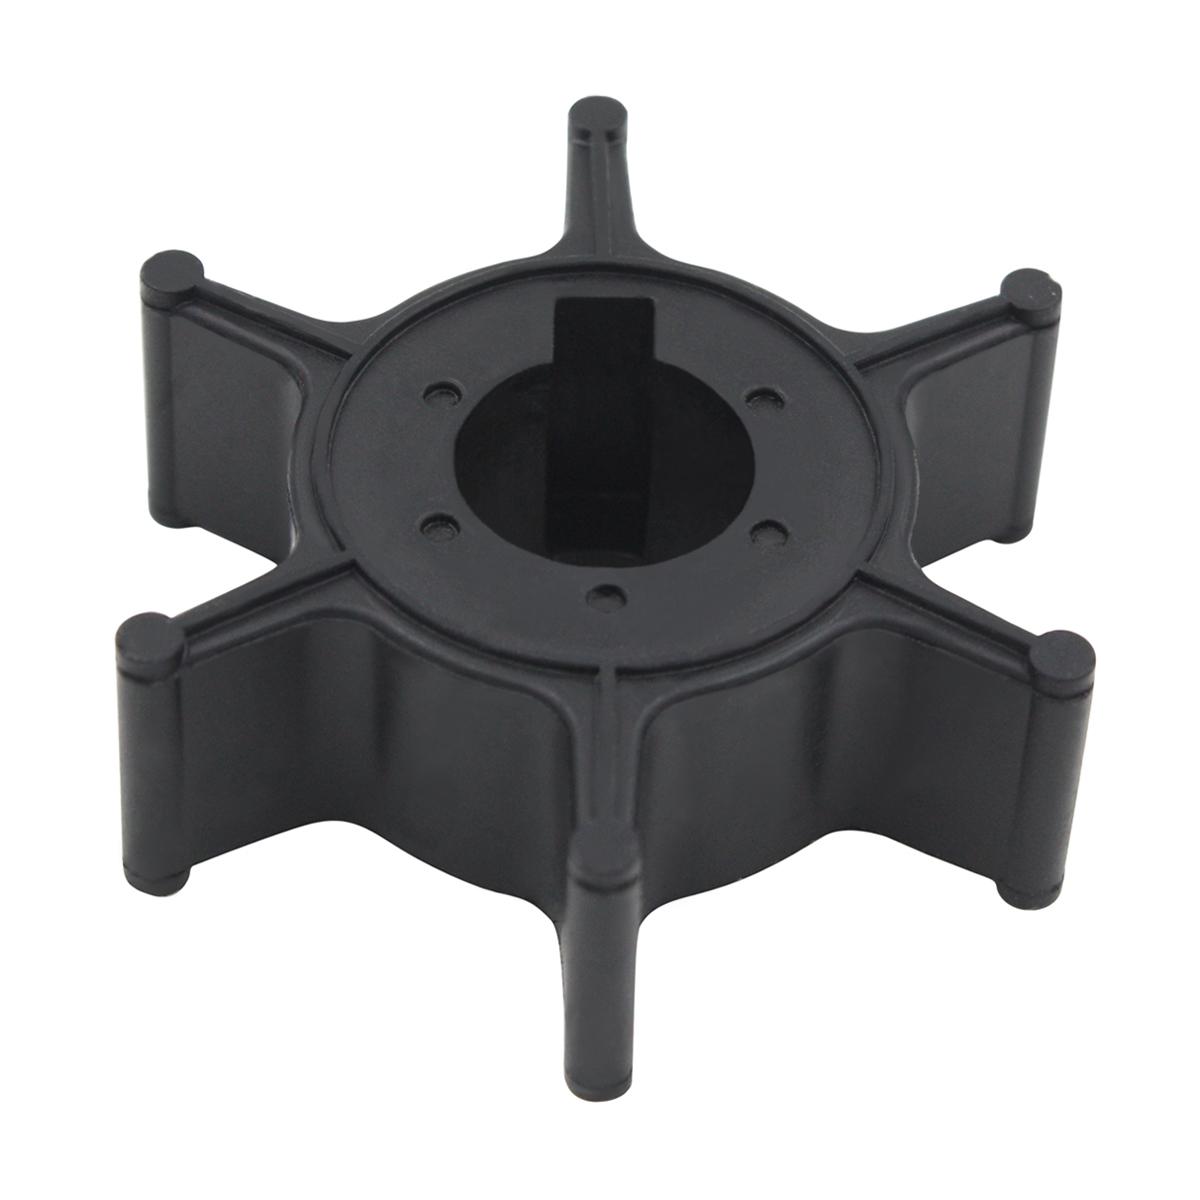 EBTOOLS Water Pump Impeller Part Fit For 4Hp 5Hp 6Hp 6E0-44352-003 T6/&F6